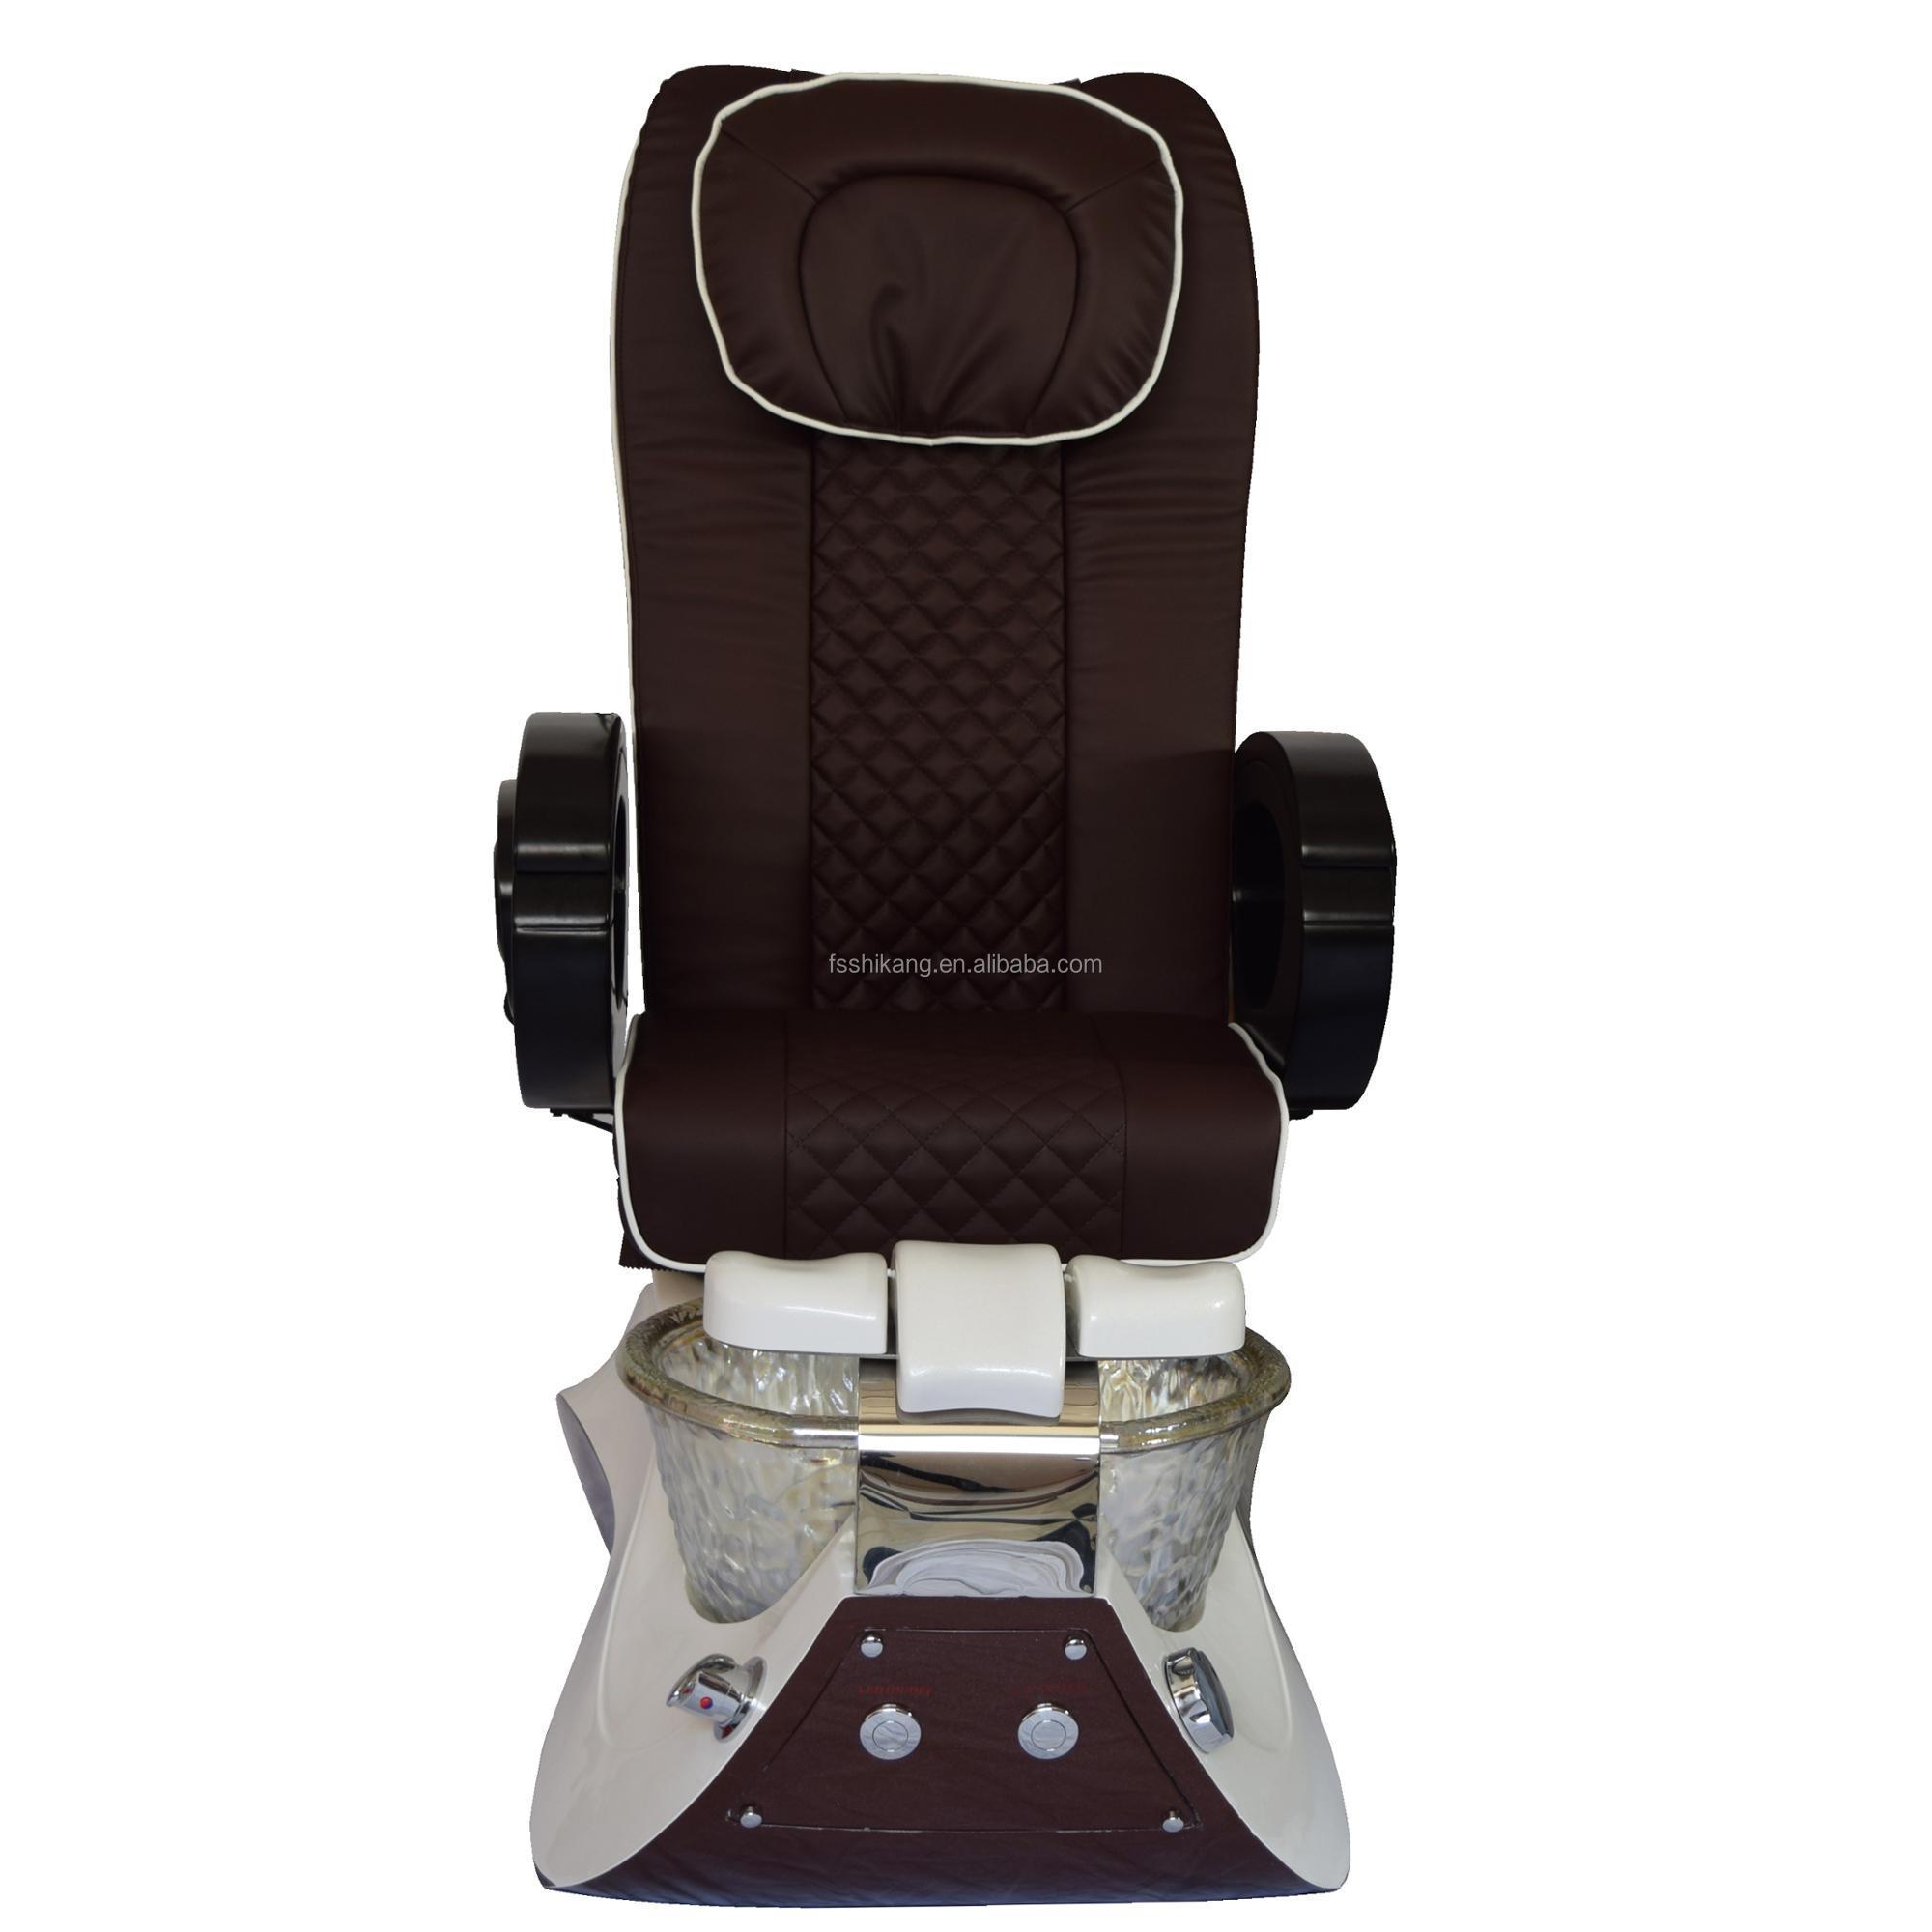 2018 New Whirlpool European Touch Pedicure Spa Chair portable